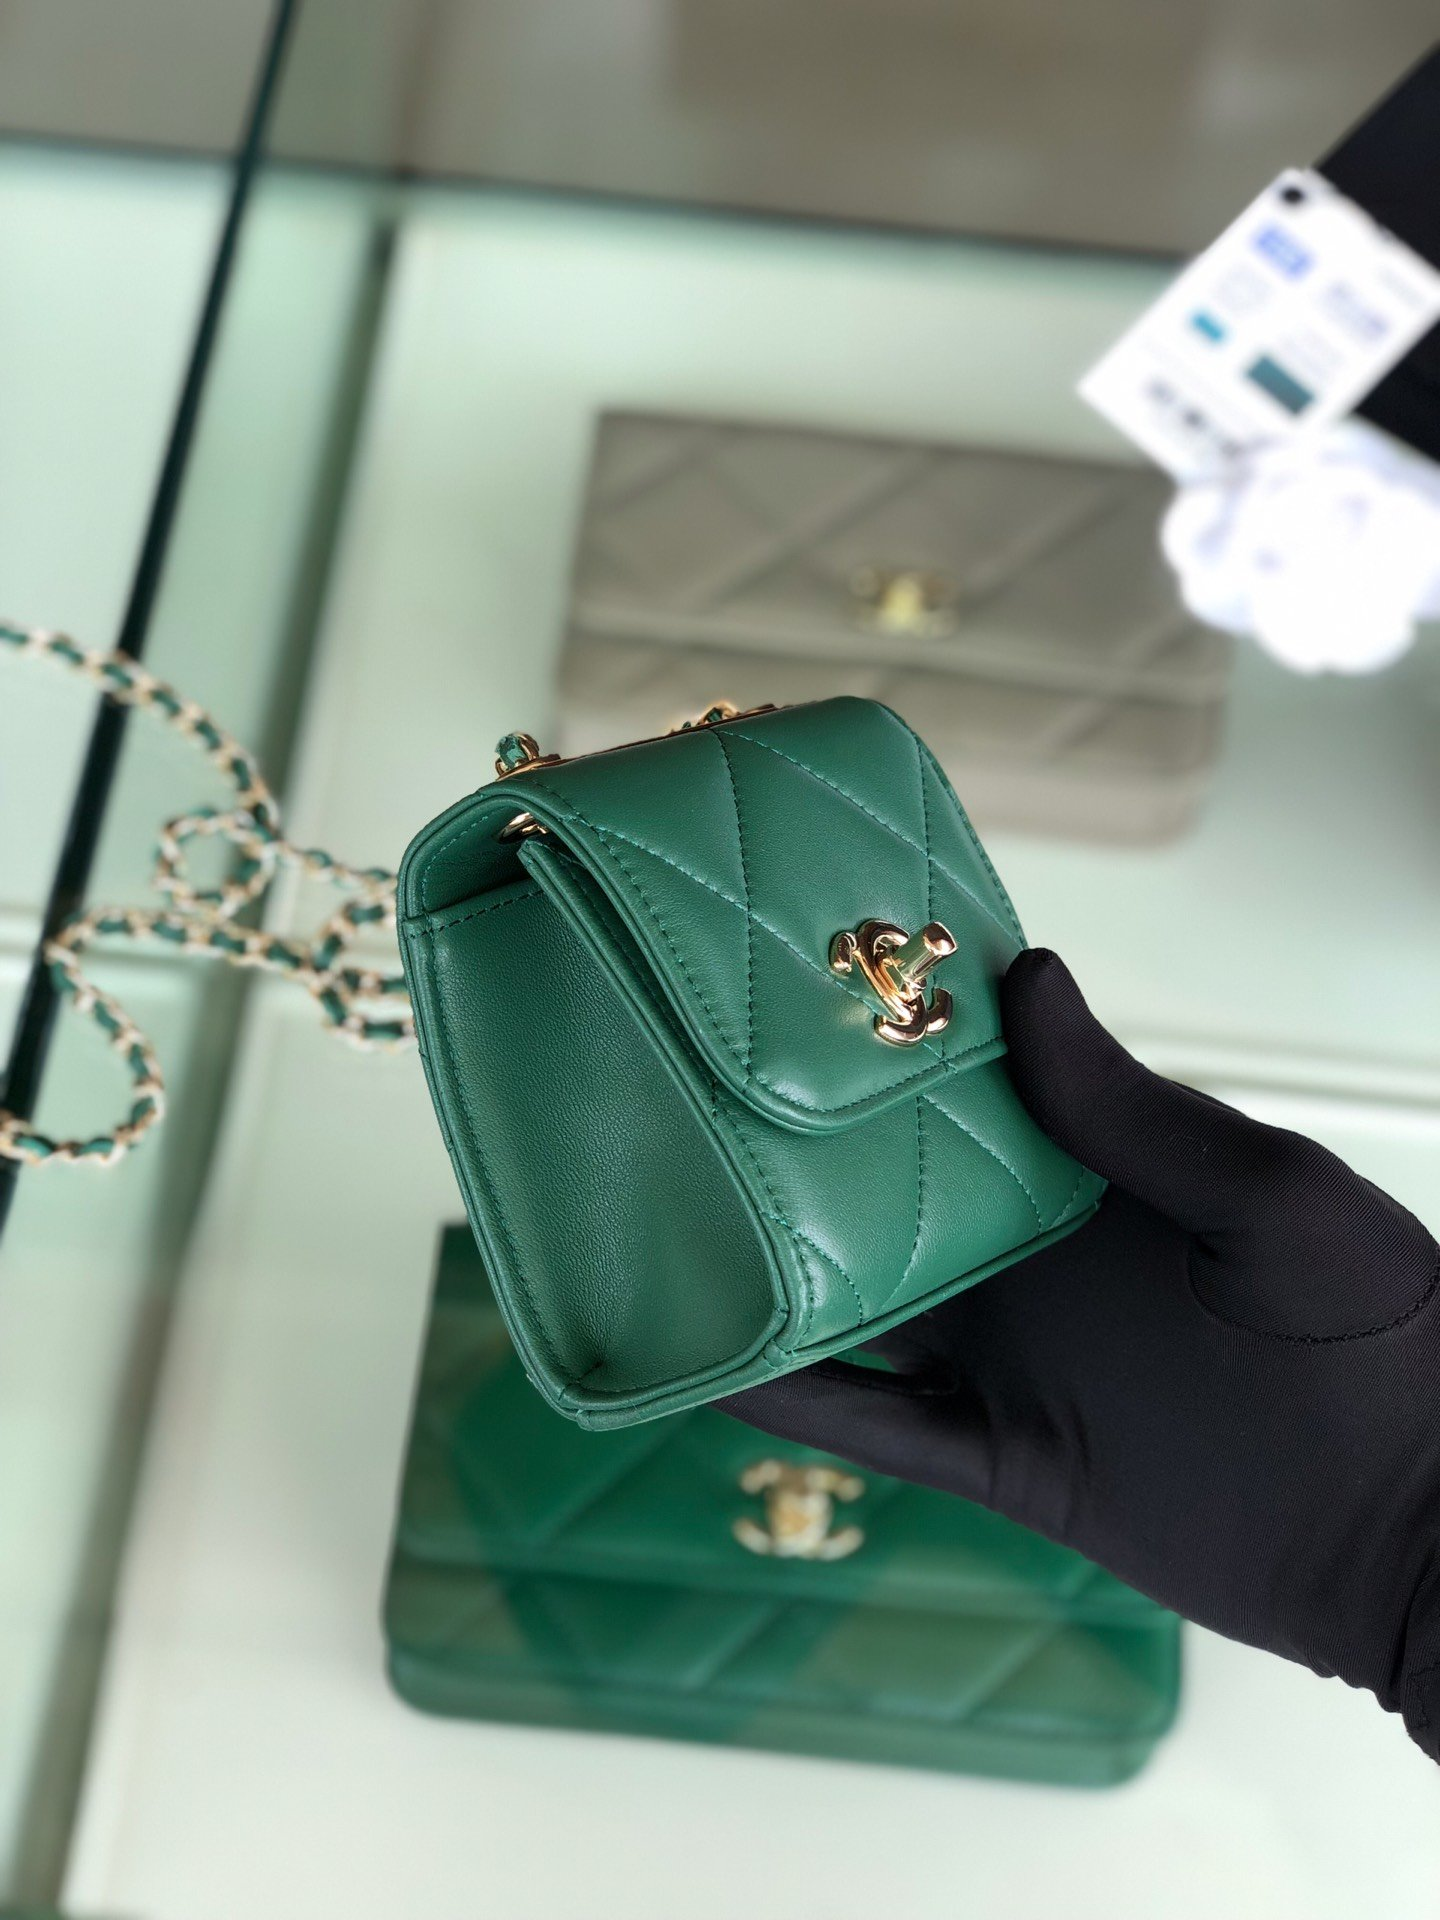 Chanel香奈儿专柜同款 大方格新款零钱包 单肩斜挎(图3)